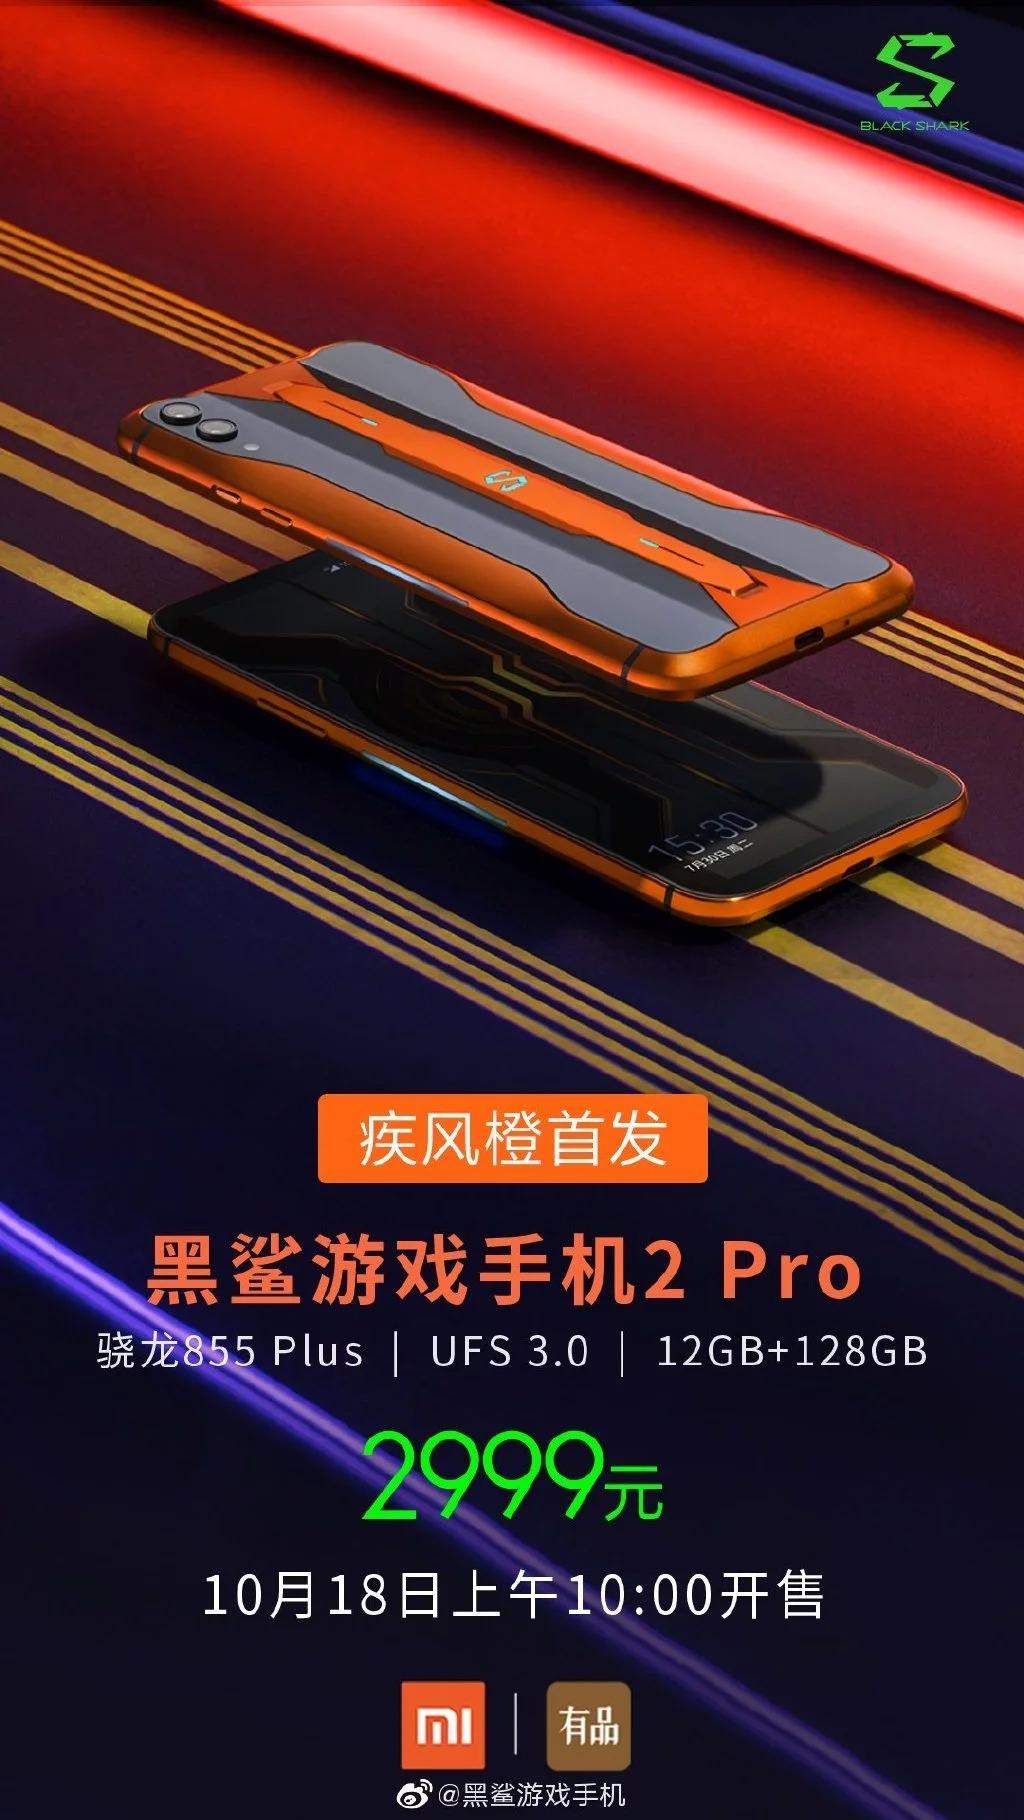 Black Shark 2 Pro está